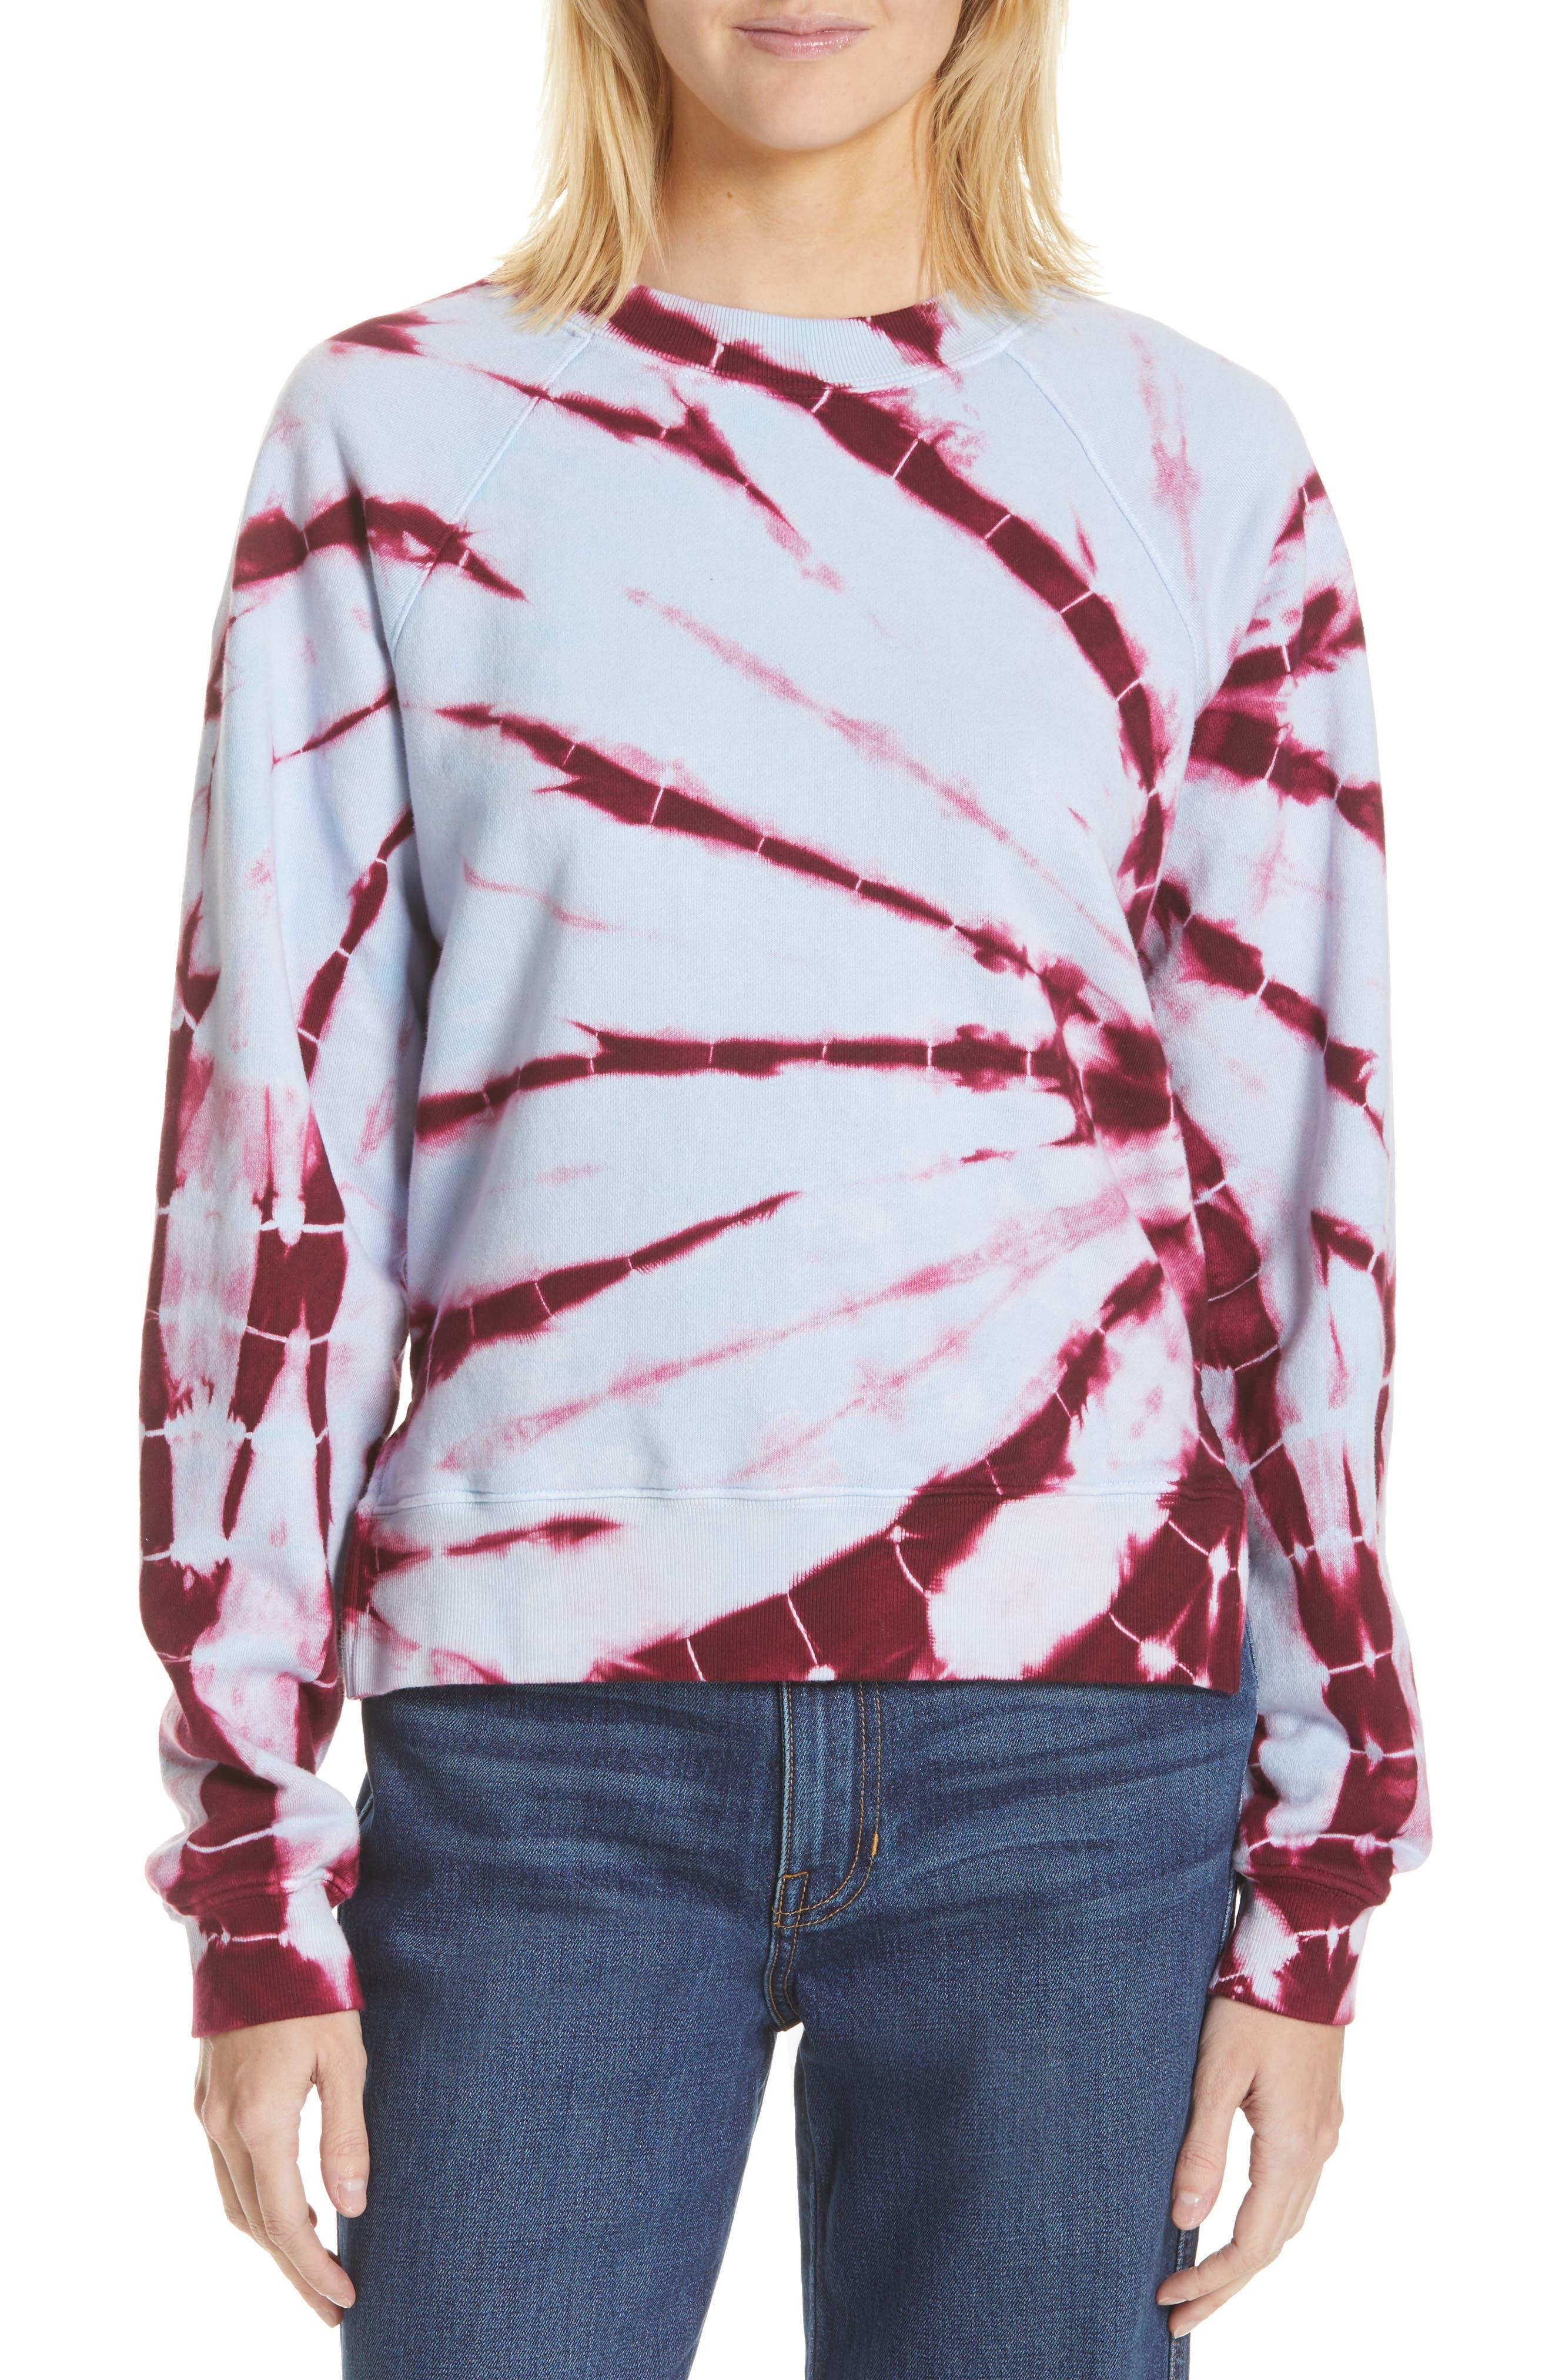 PROENZA SCHOULER, PSWL Tie Dye Sweatshirt, Main thumbnail 1, color, BABY BLUE/ RED TIE DYE